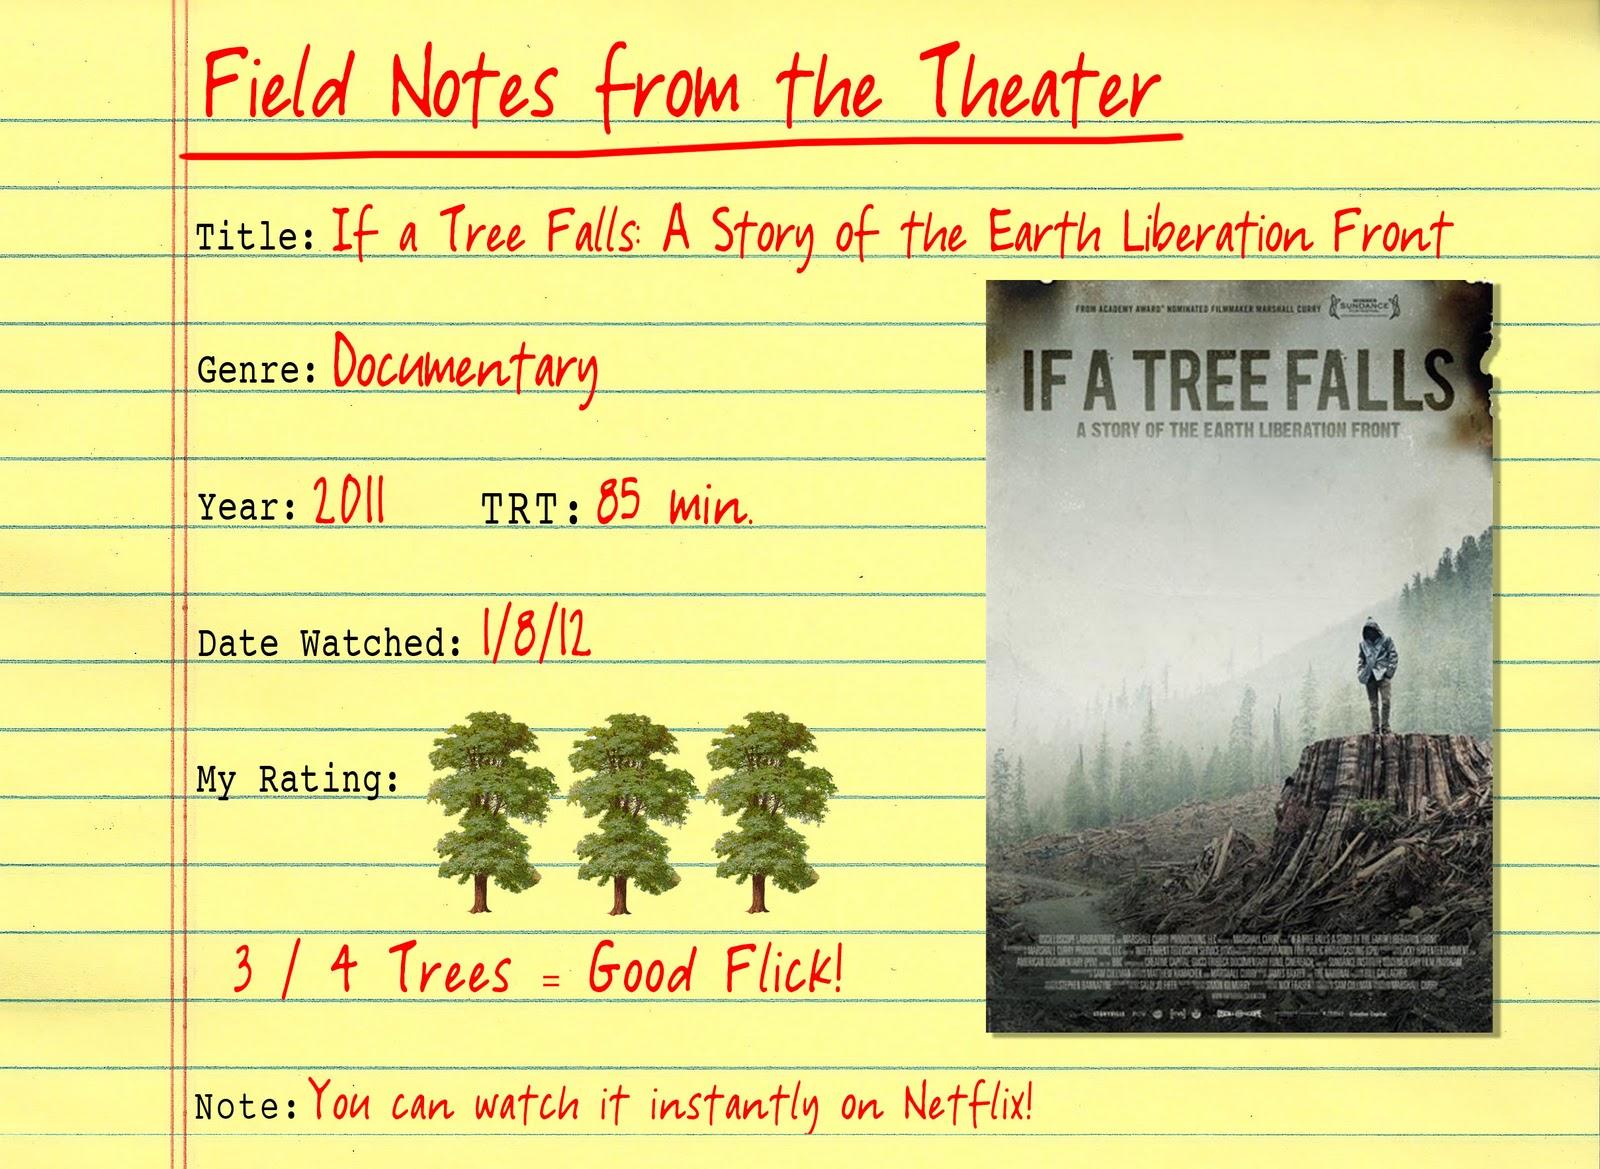 http://2.bp.blogspot.com/-LHaaQPCwNi8/Tw6E_qFXYyI/AAAAAAAAAE0/bp75u-n8PmY/s1600/If+a+Tree+Falls+-+Field+Notes+Graphic.jpg